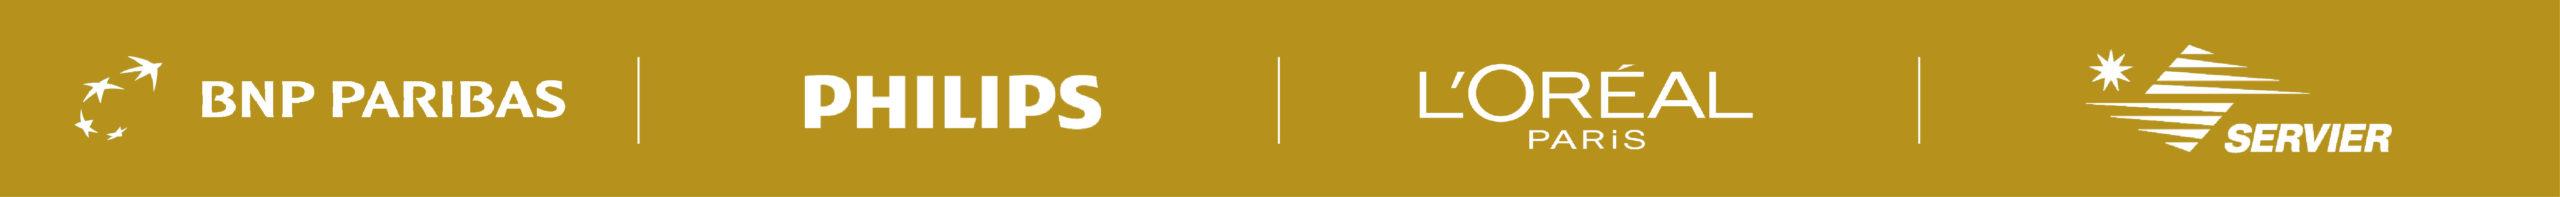 logos-clients-01